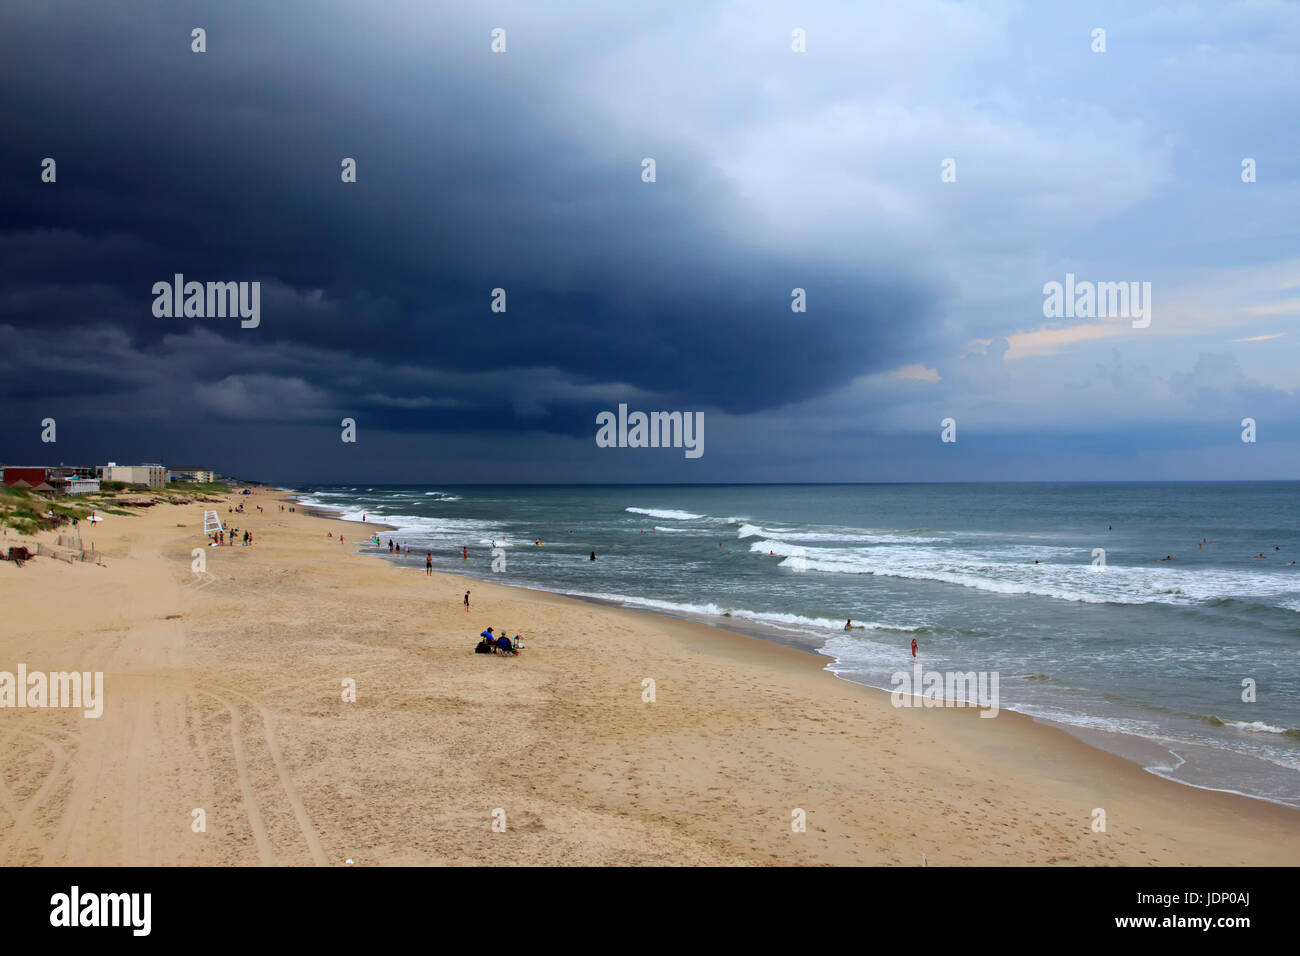 Tormenta acercándose nags head beach Outer Banks de Carolina del Norte Imagen De Stock